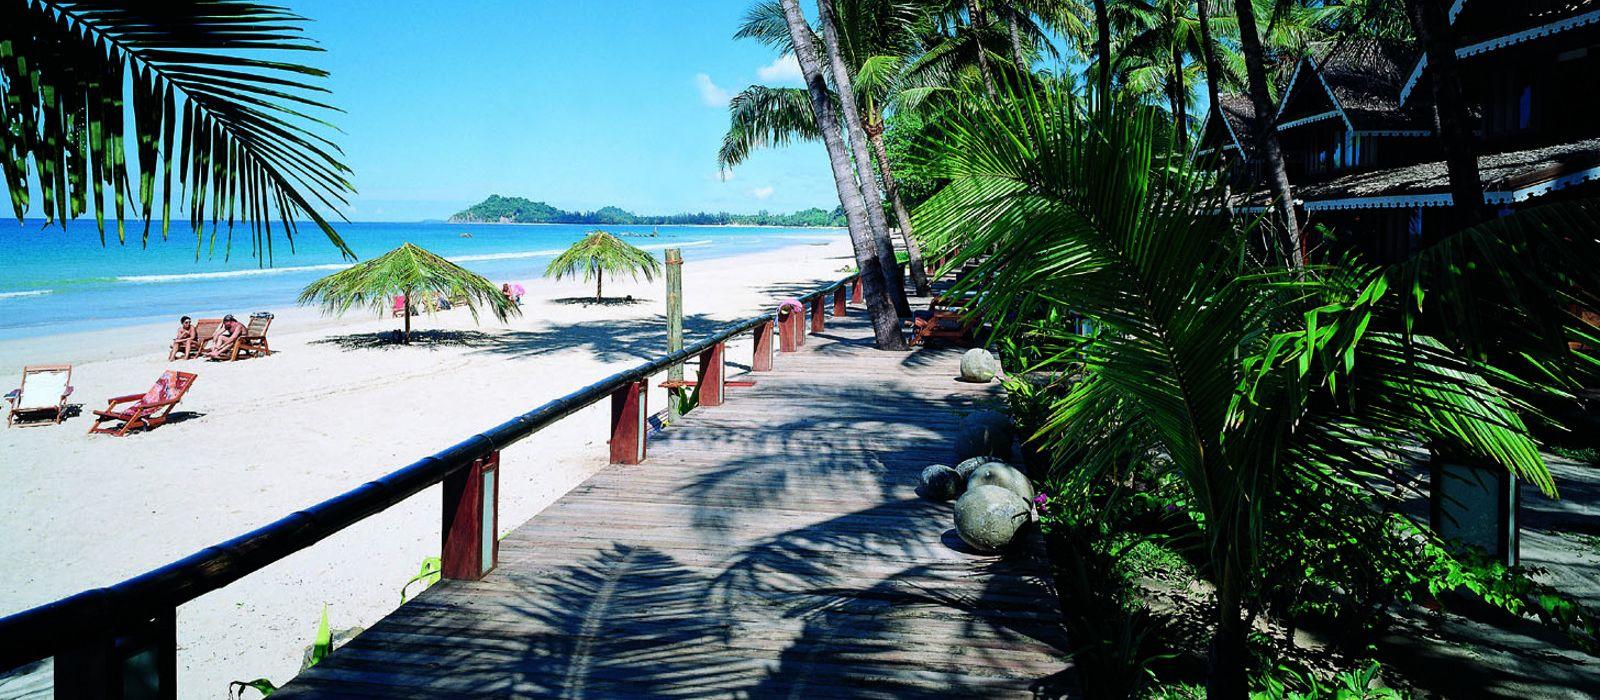 Reiseziel Ngwe Saung Strand Myanmar